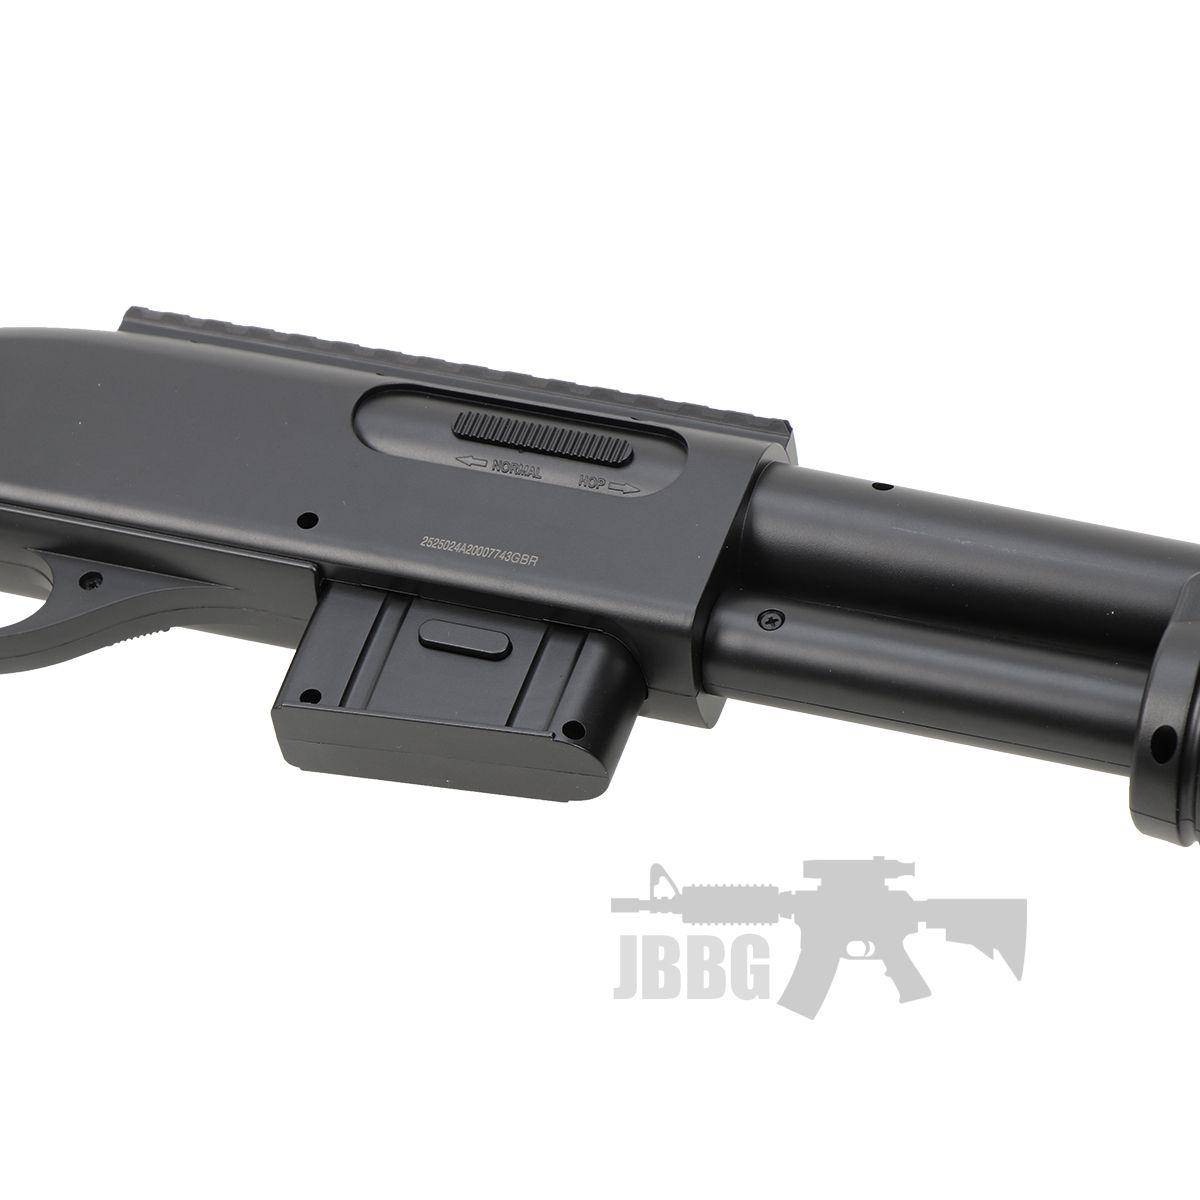 shotgun airsoft jbbg 55